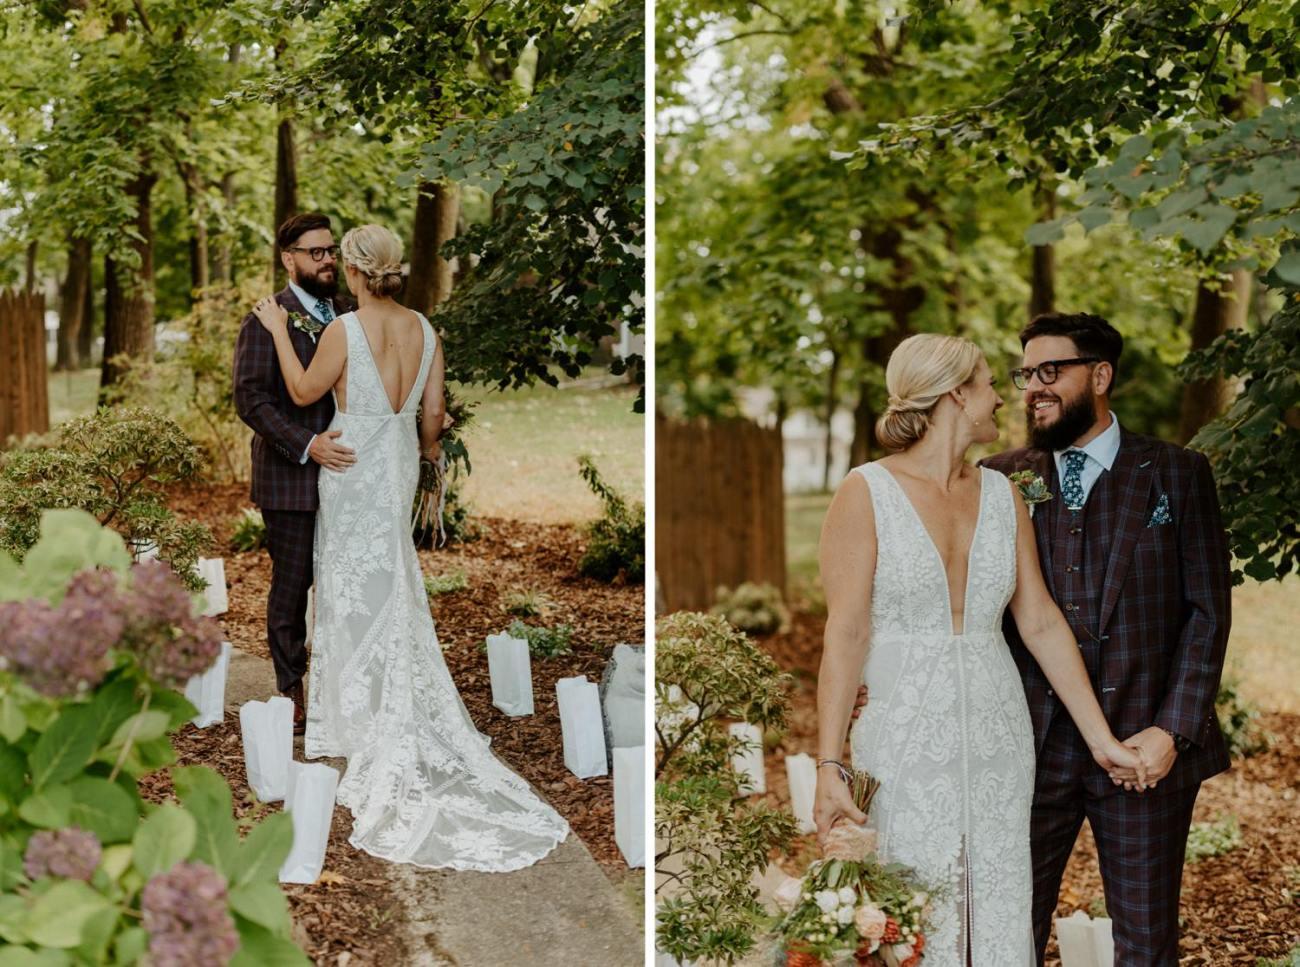 New Jersey Fall Backyard Wedding Bend Wedding Photographer NJ Wedding Photographer Anais Possamai Photography 014